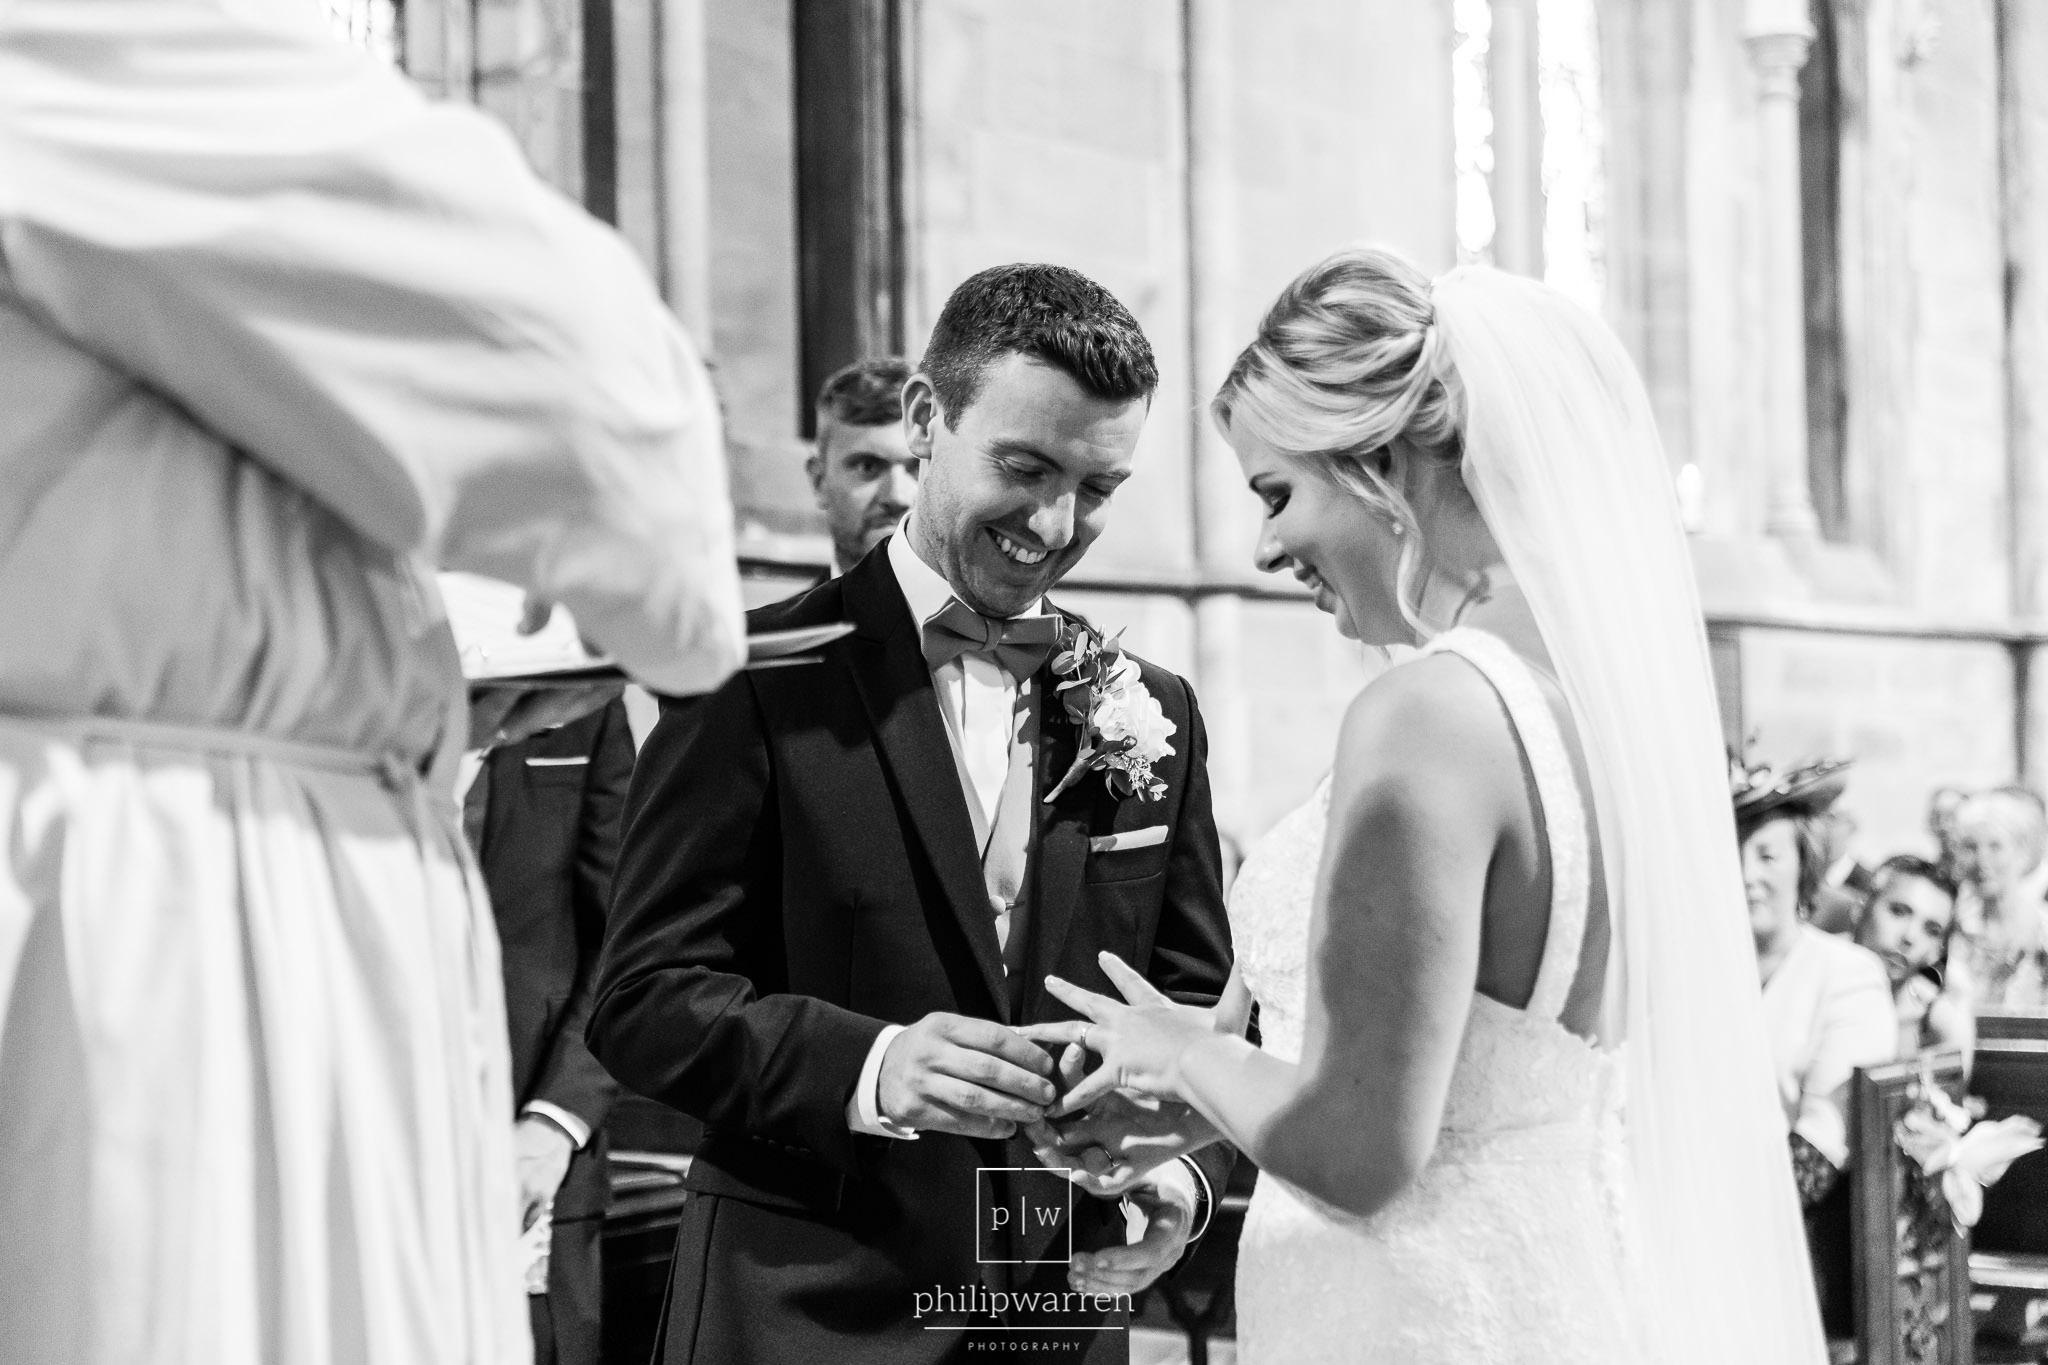 wedding photos at llanerch vineyard rachel + craig-6.jpg